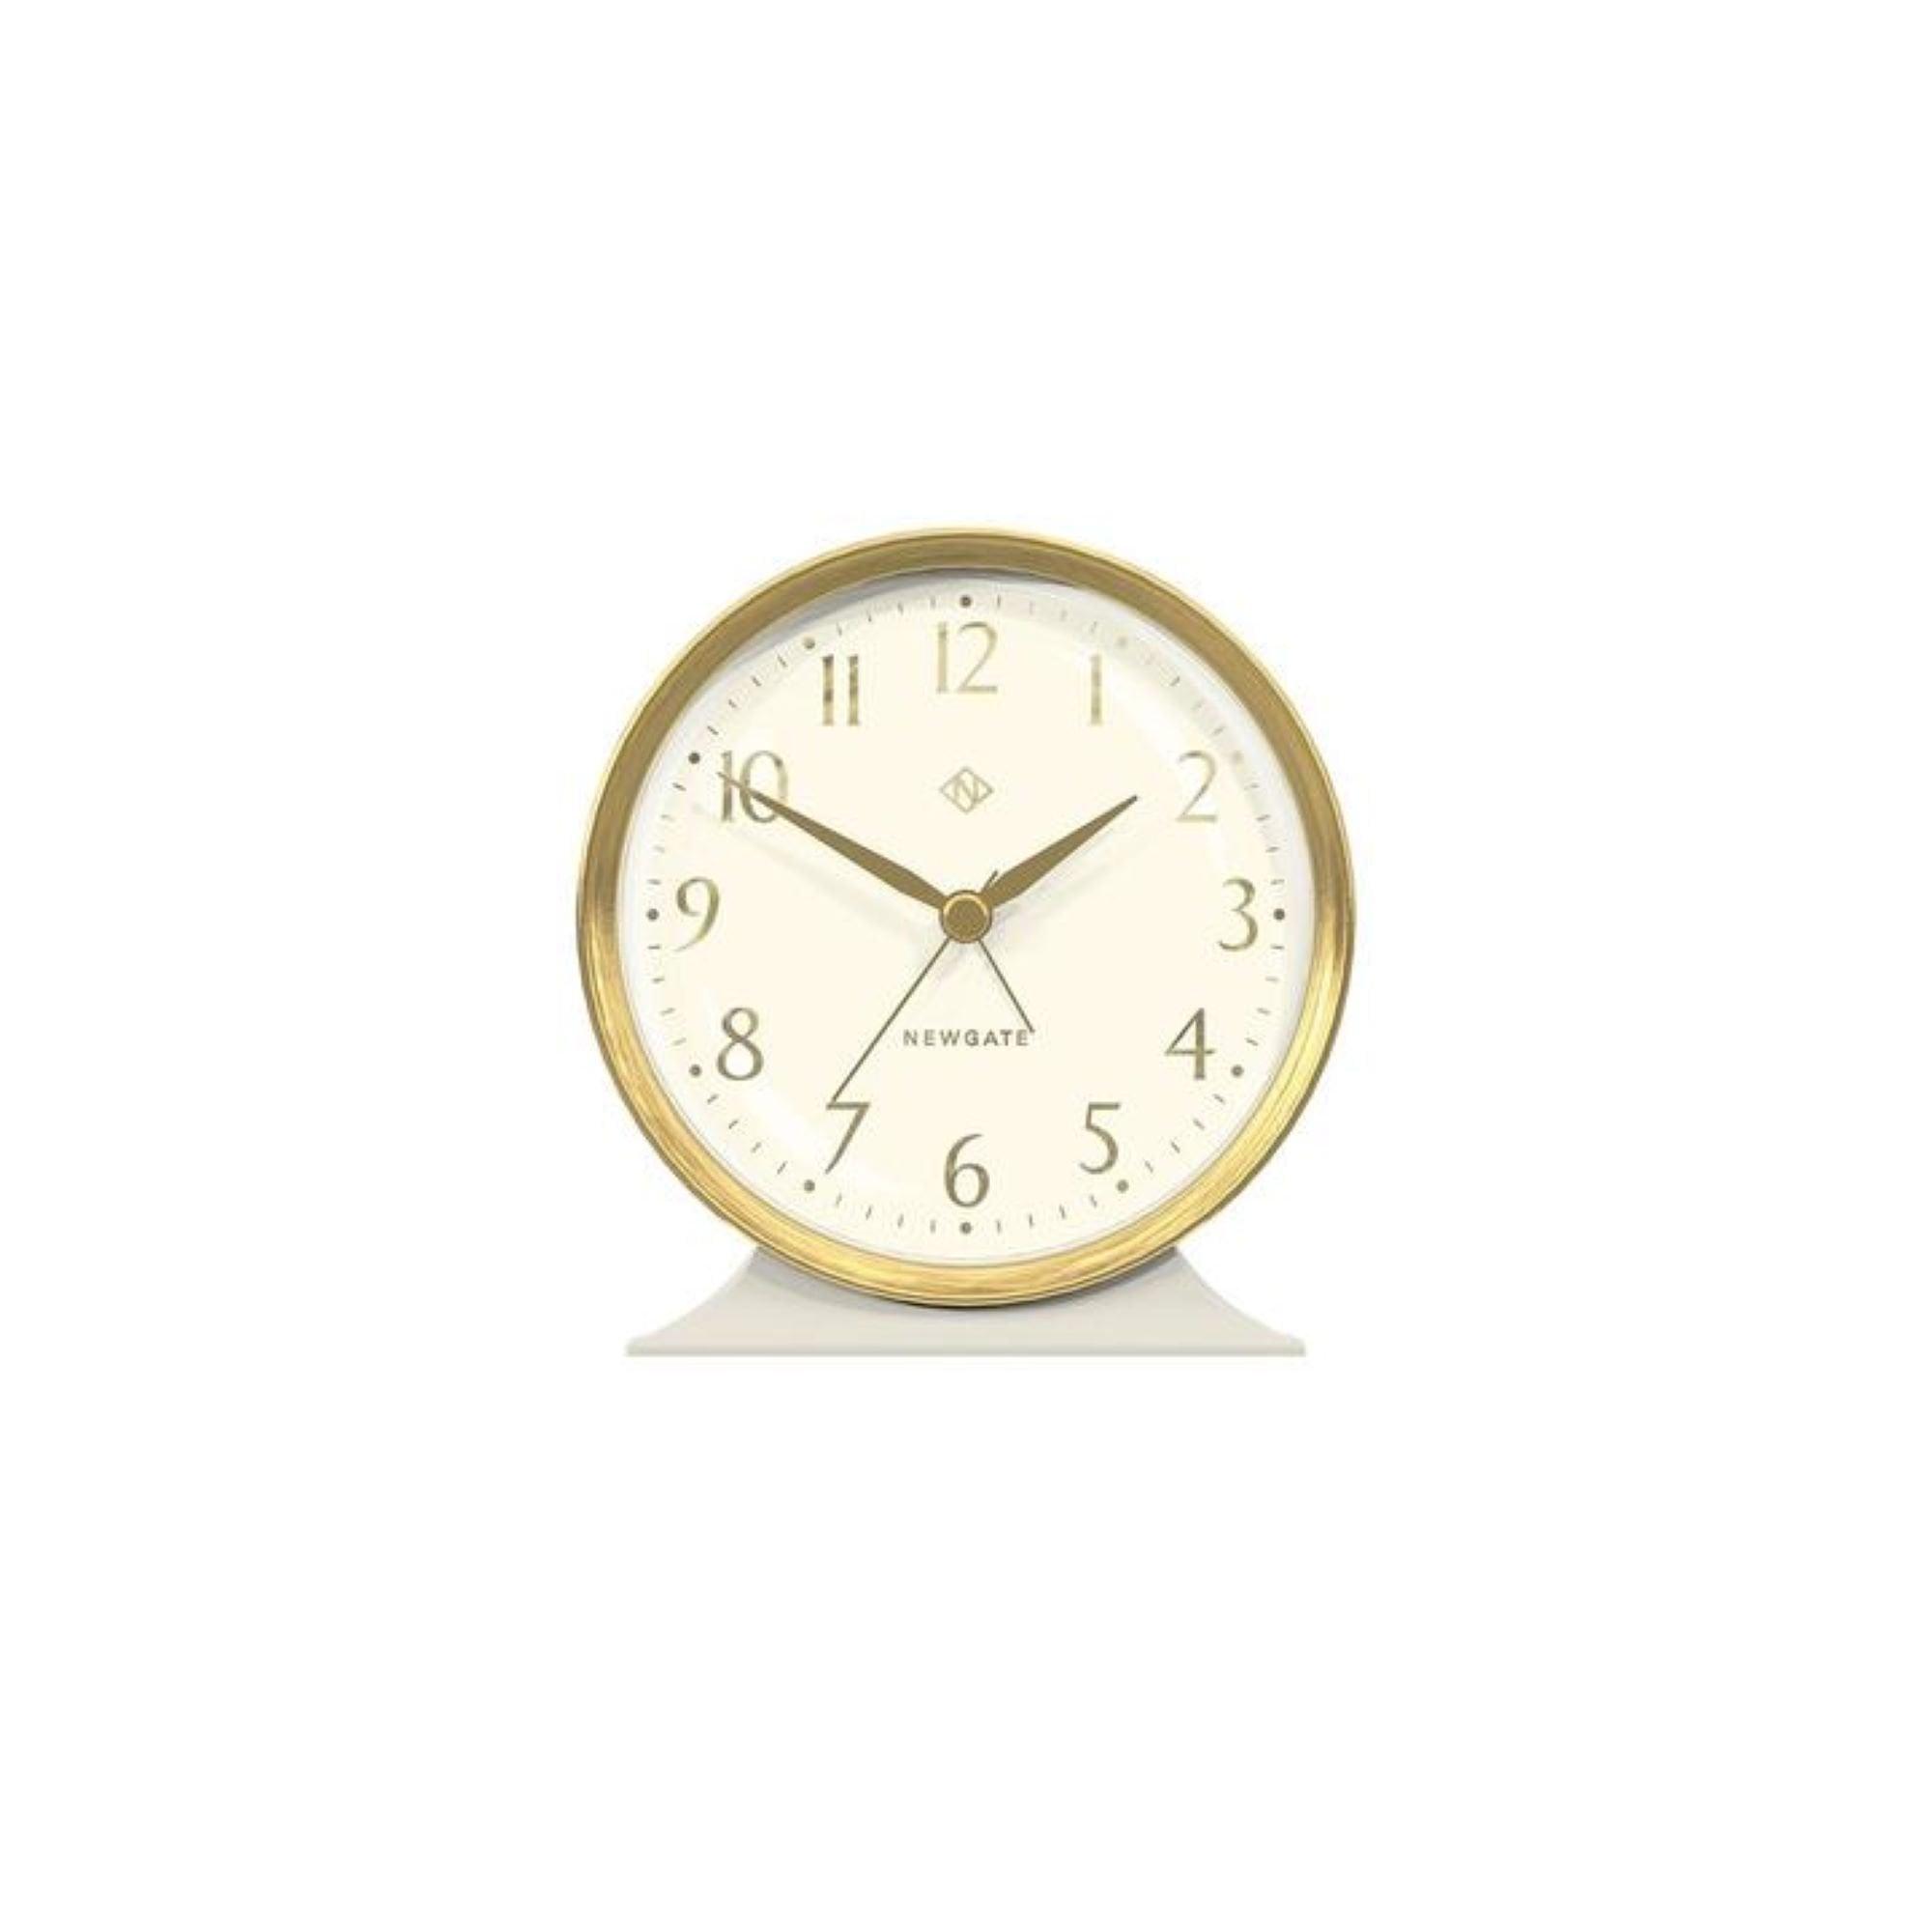 Buy Newgate Art Deco Hotel Alarm Clock Black By Design